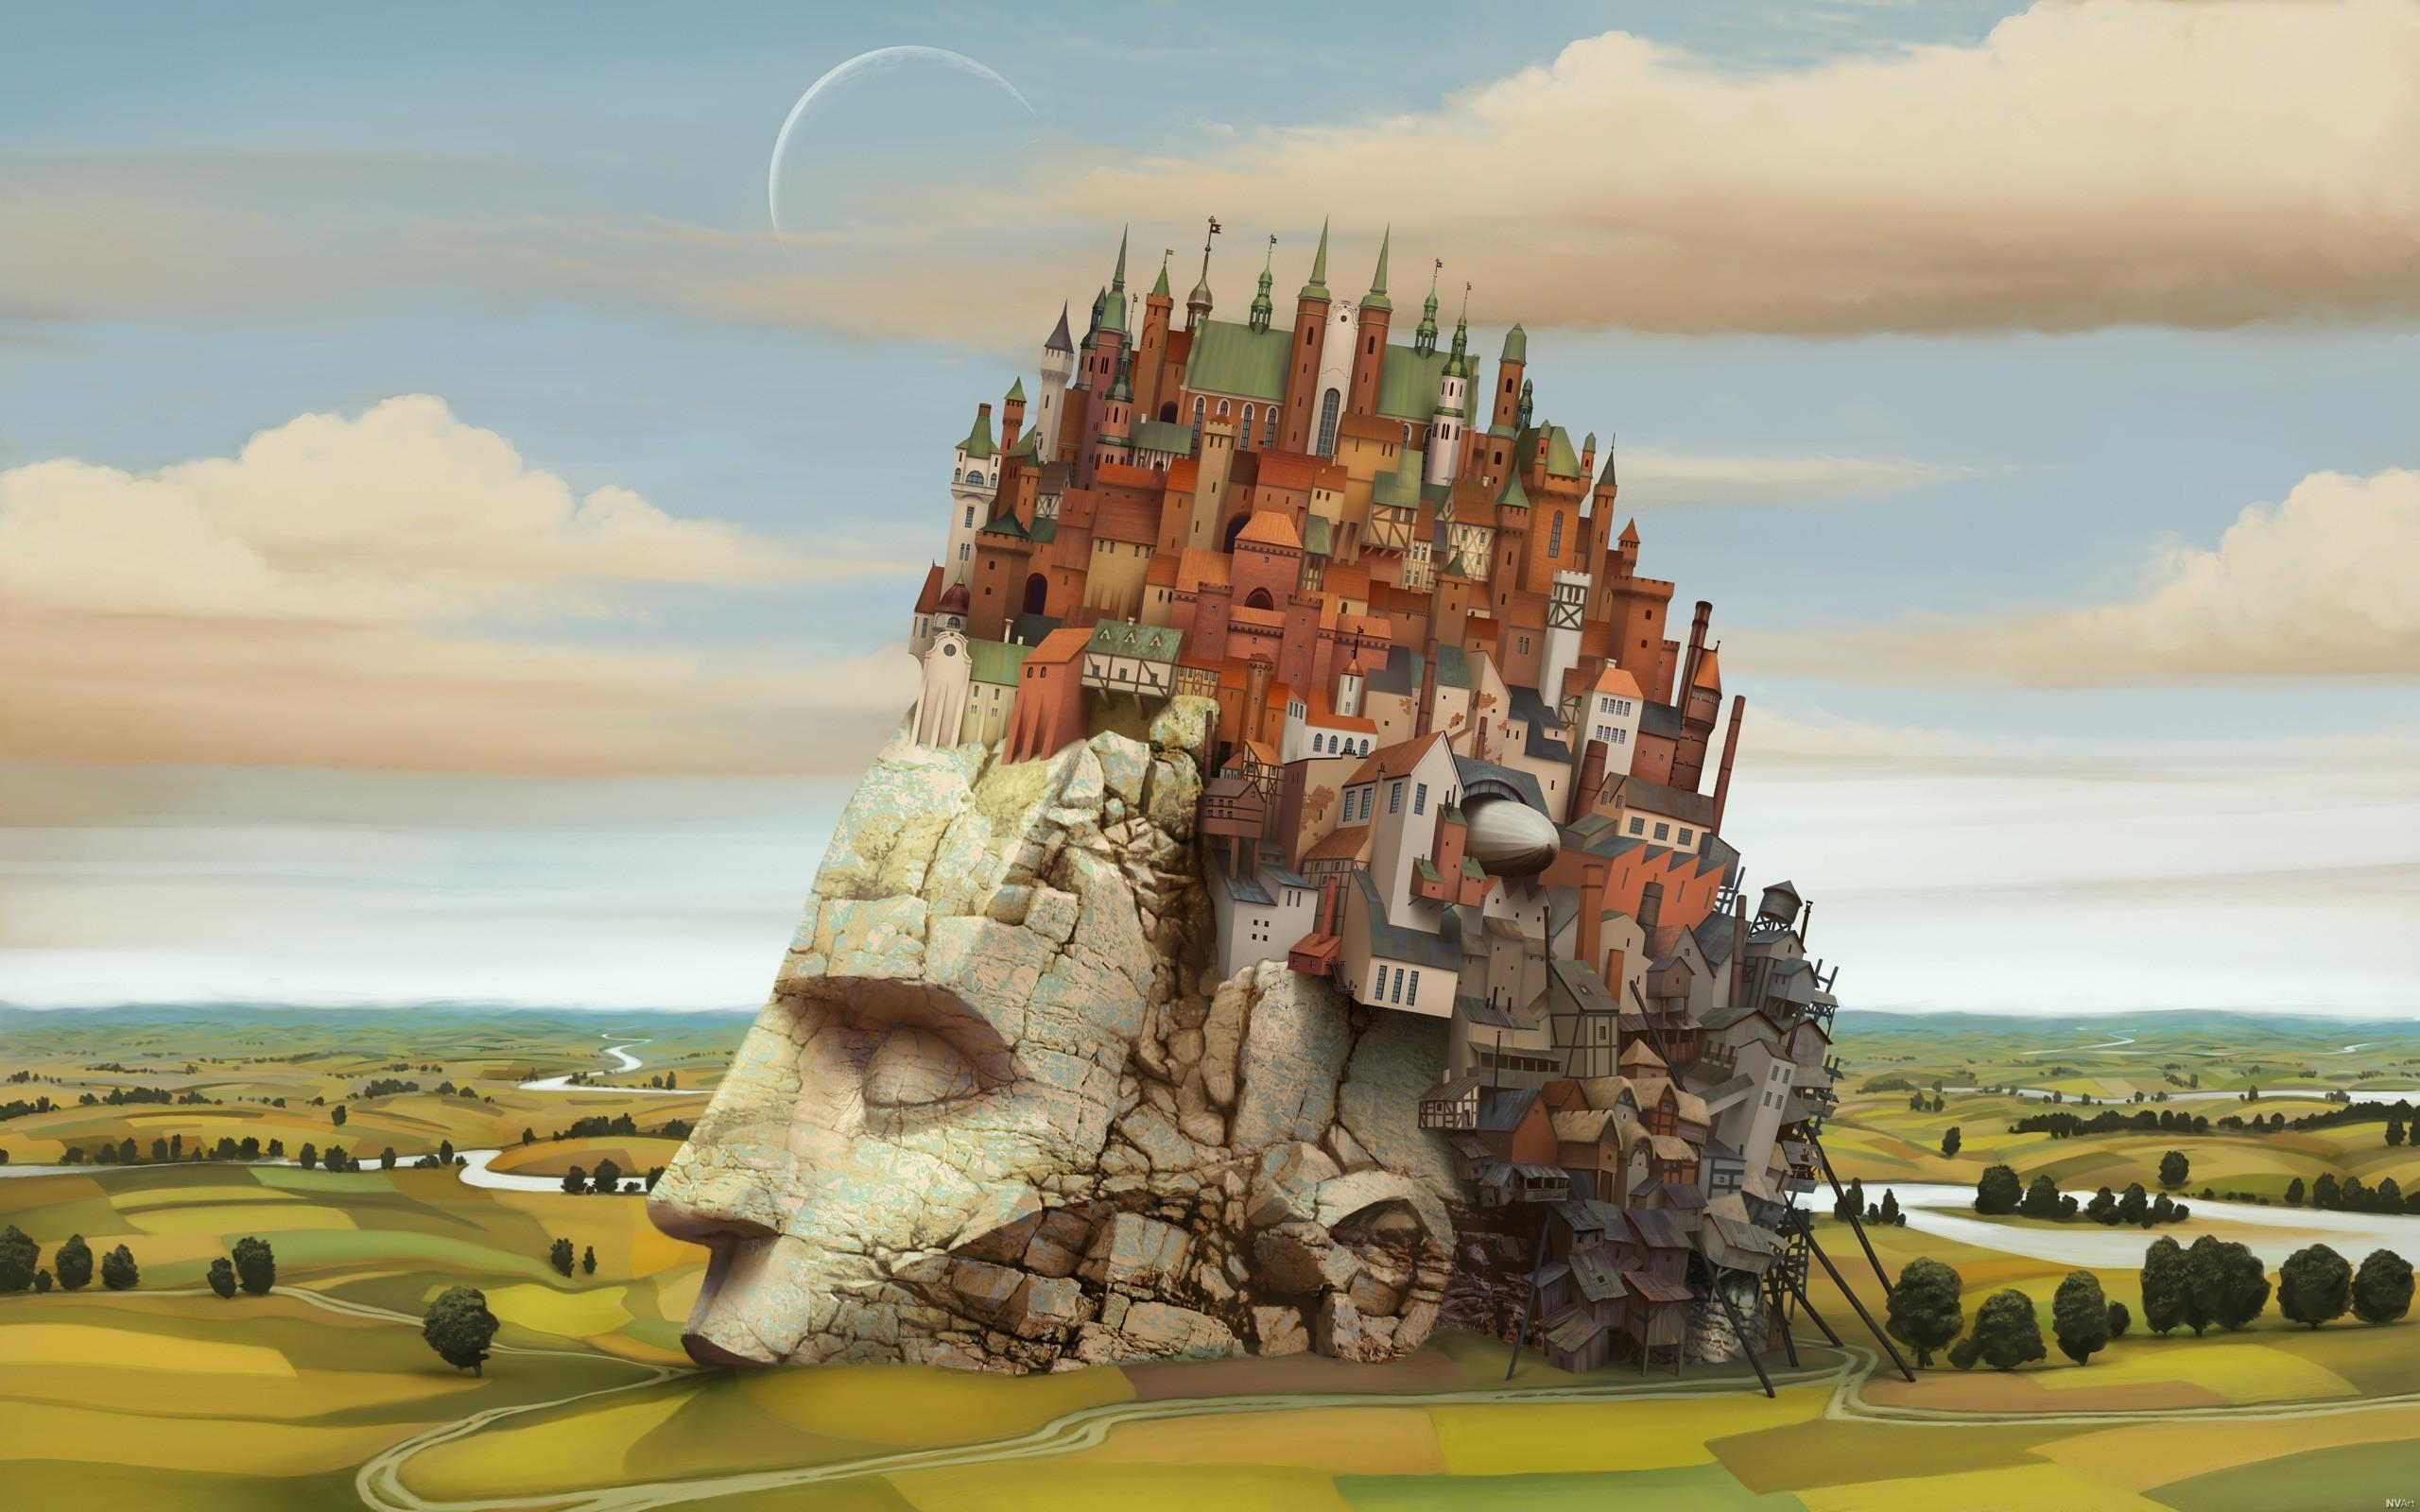 General 2560x1600 town fantasy city fantasy art artwork landscape